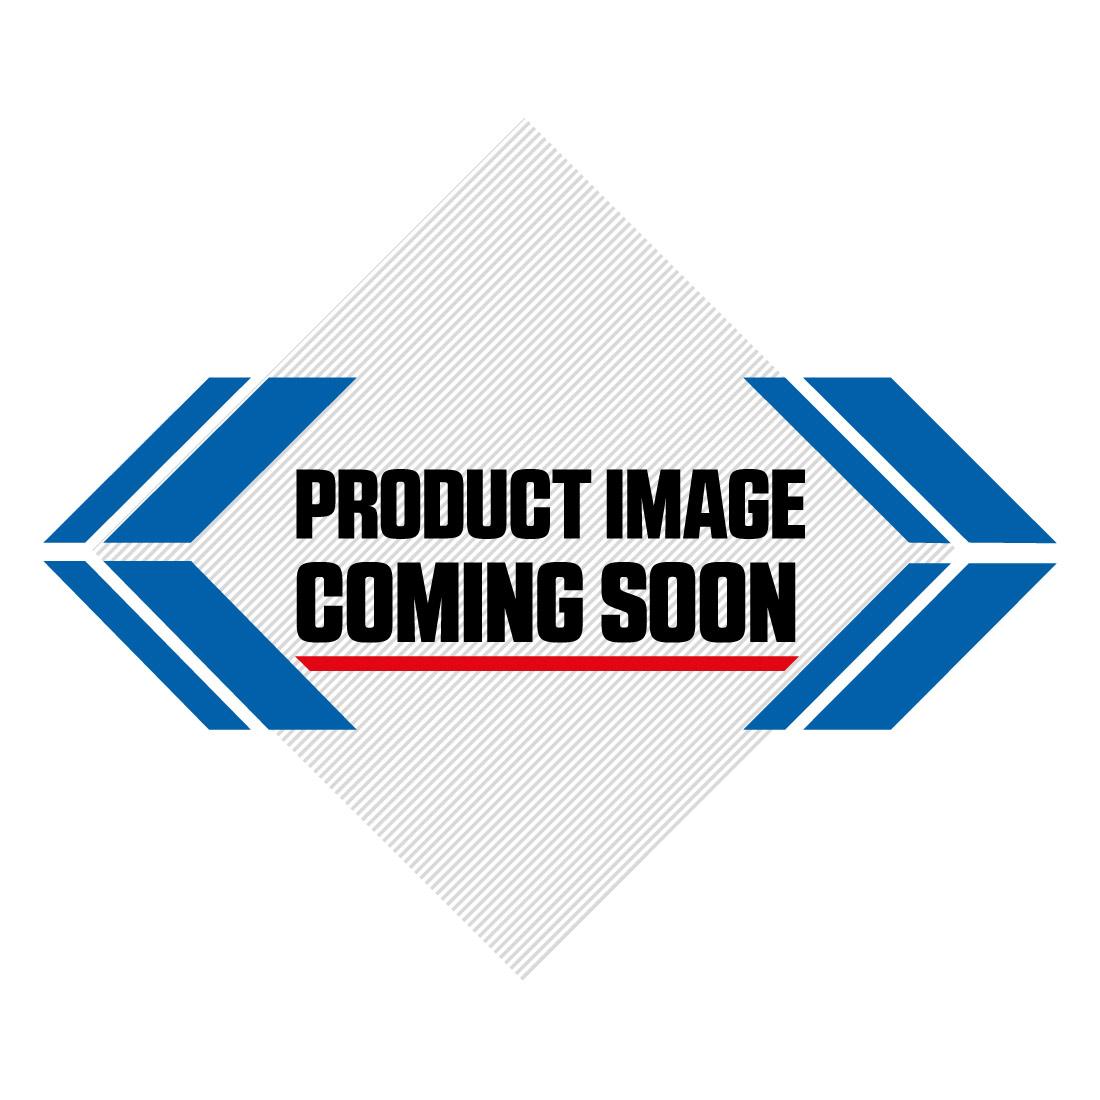 Suzuki Restyled Plastic Kit  RM 85 (00-20) RM Yellow 01-on Image-5>